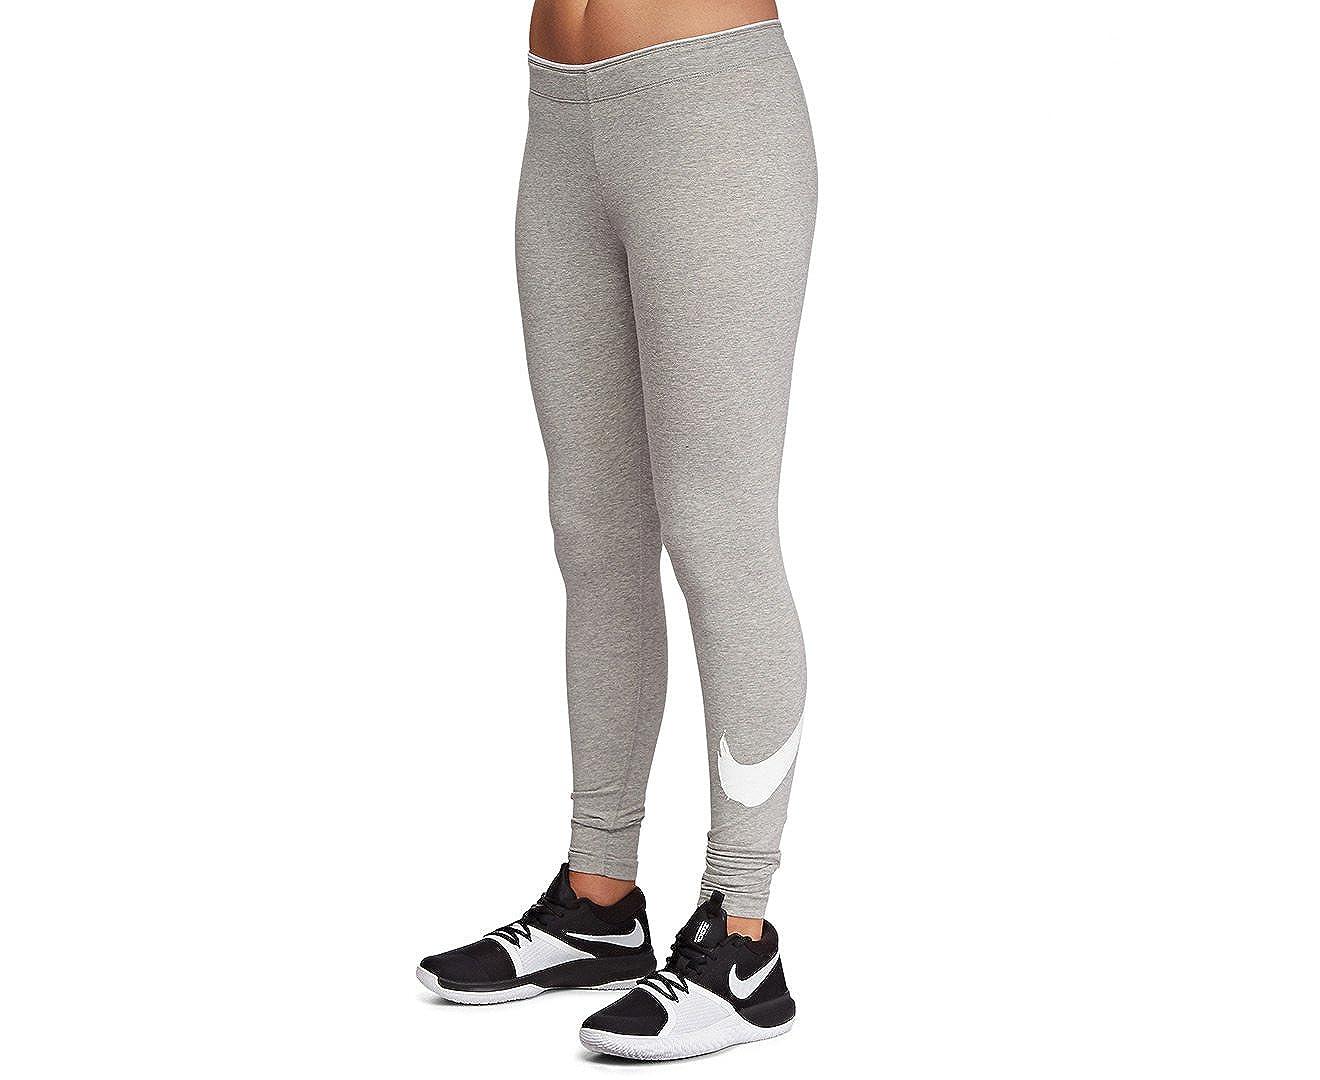 0f2079426a5 Amazon.com  Nike Womens Club Swoosh Tights Dark Grey Heather White X-Small   Sports   Outdoors